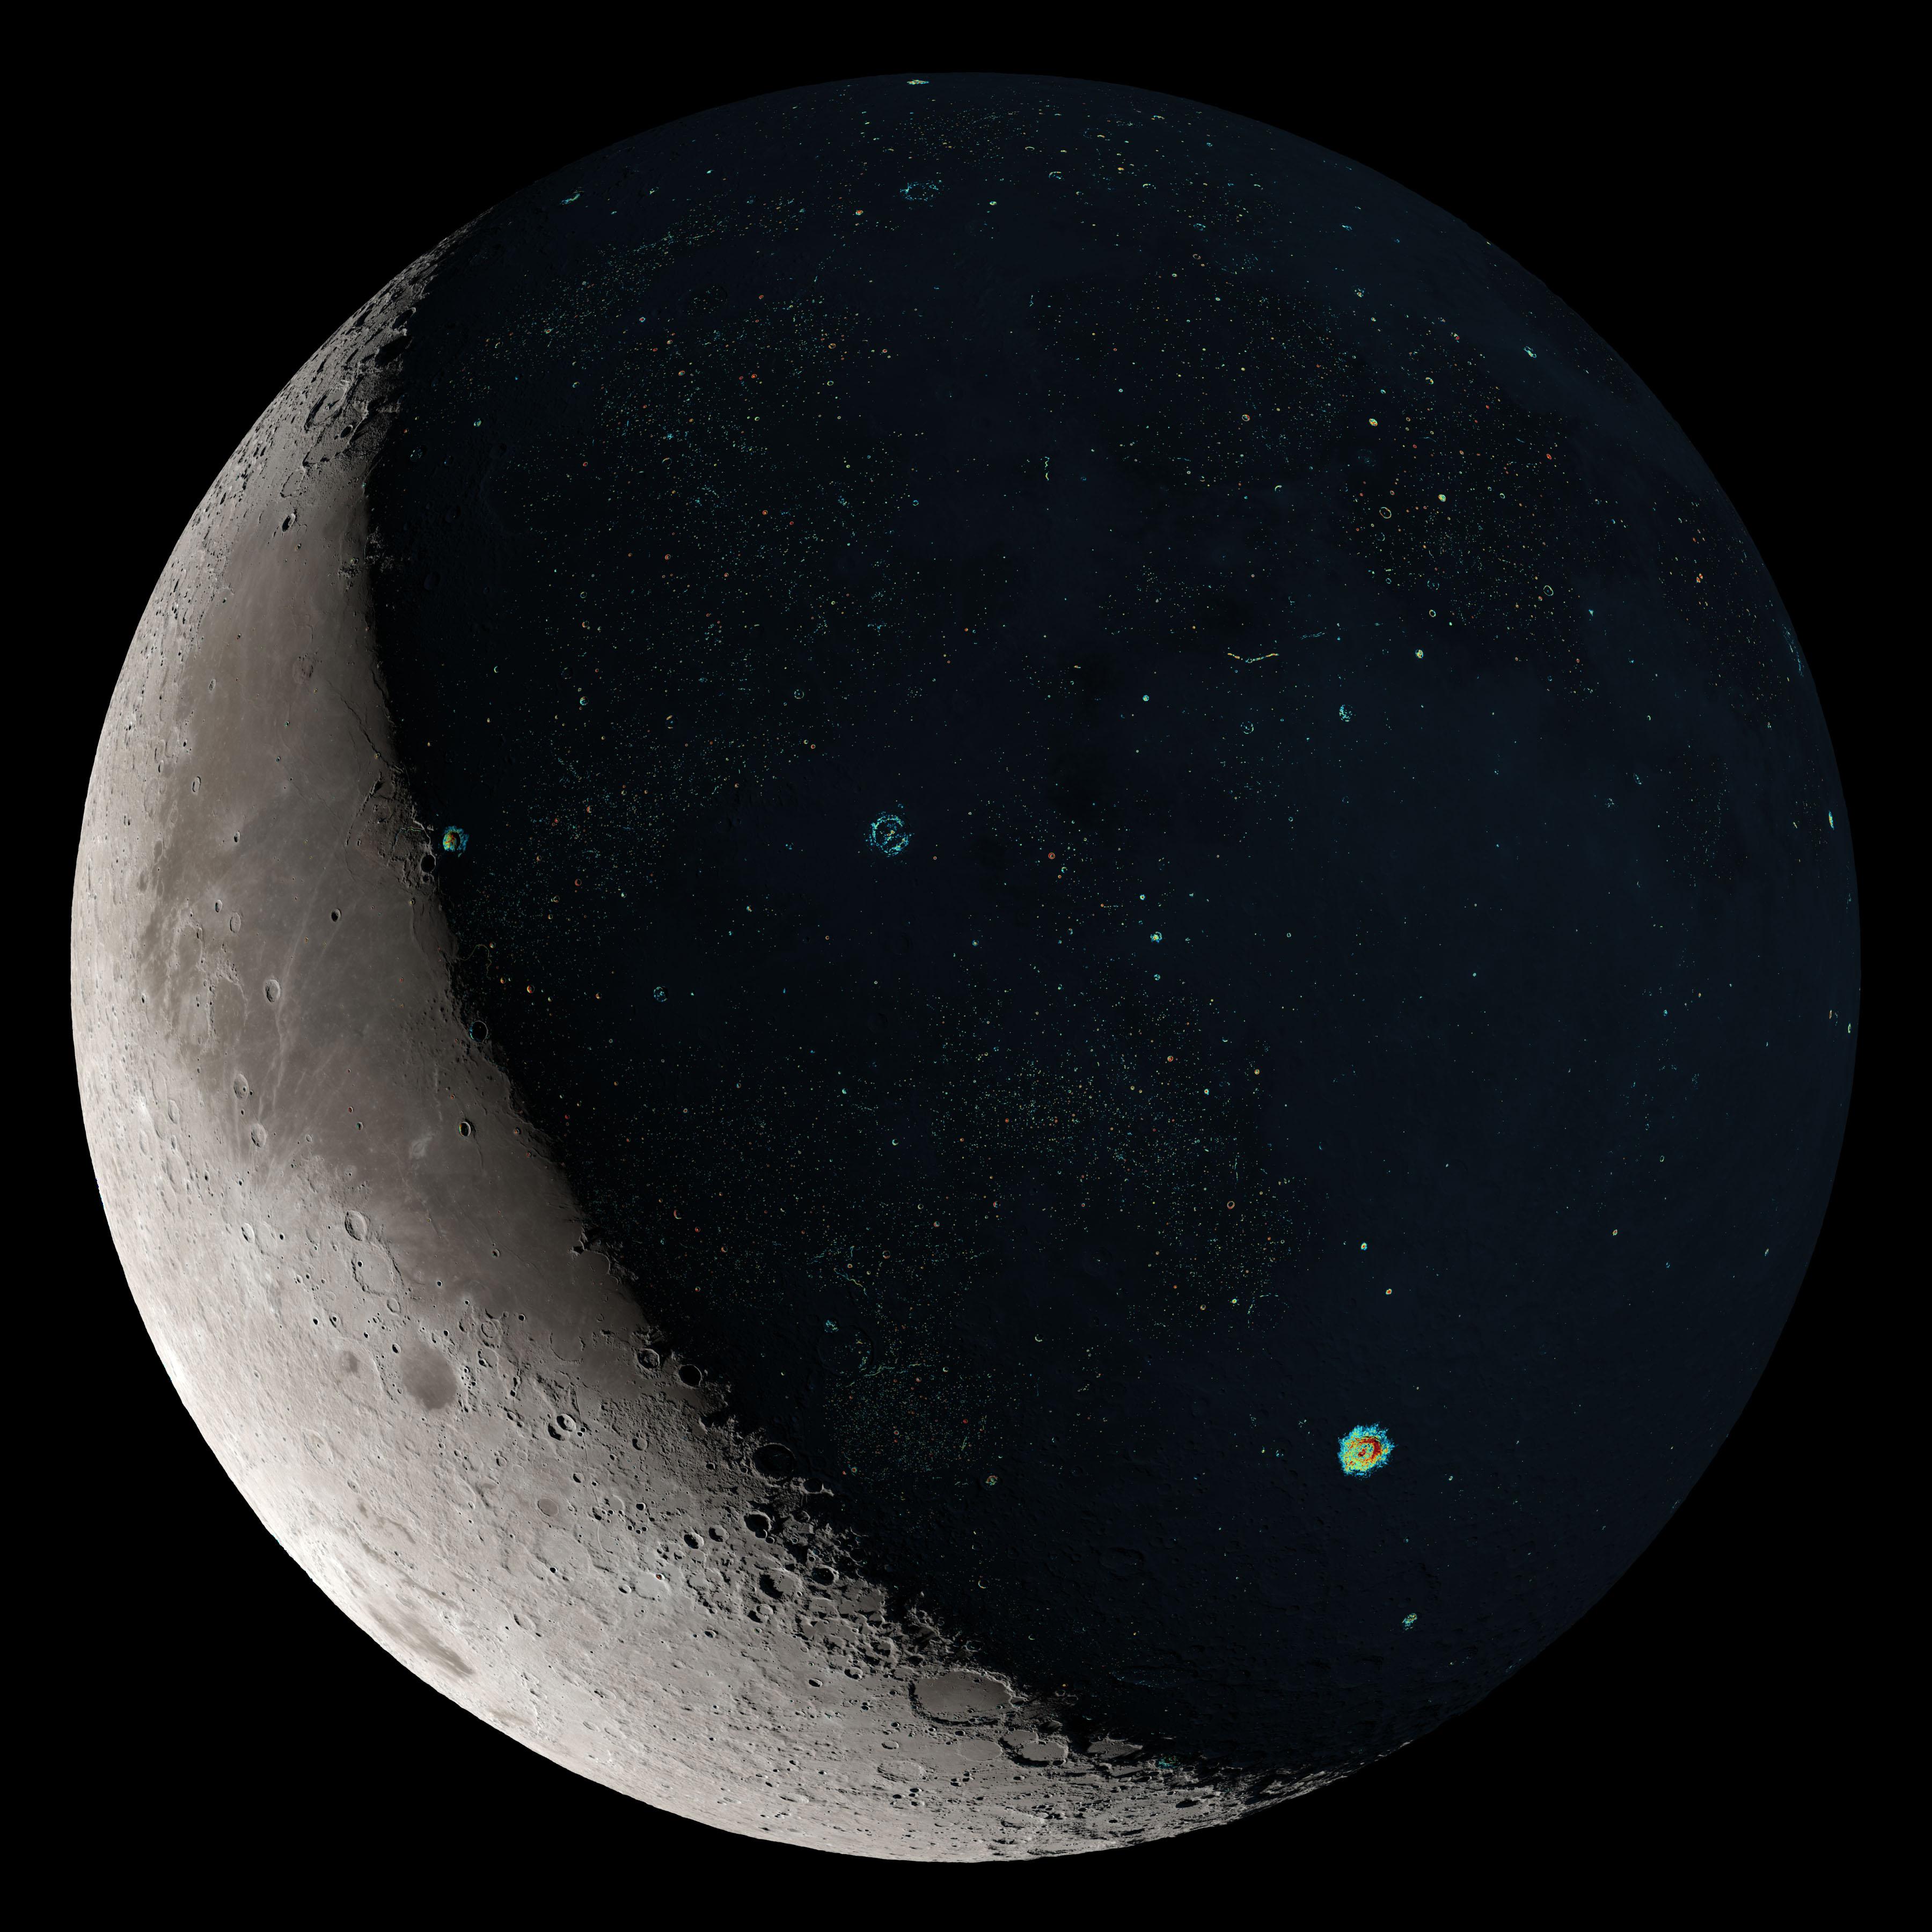 Of rocks moon dating radiometric The Age